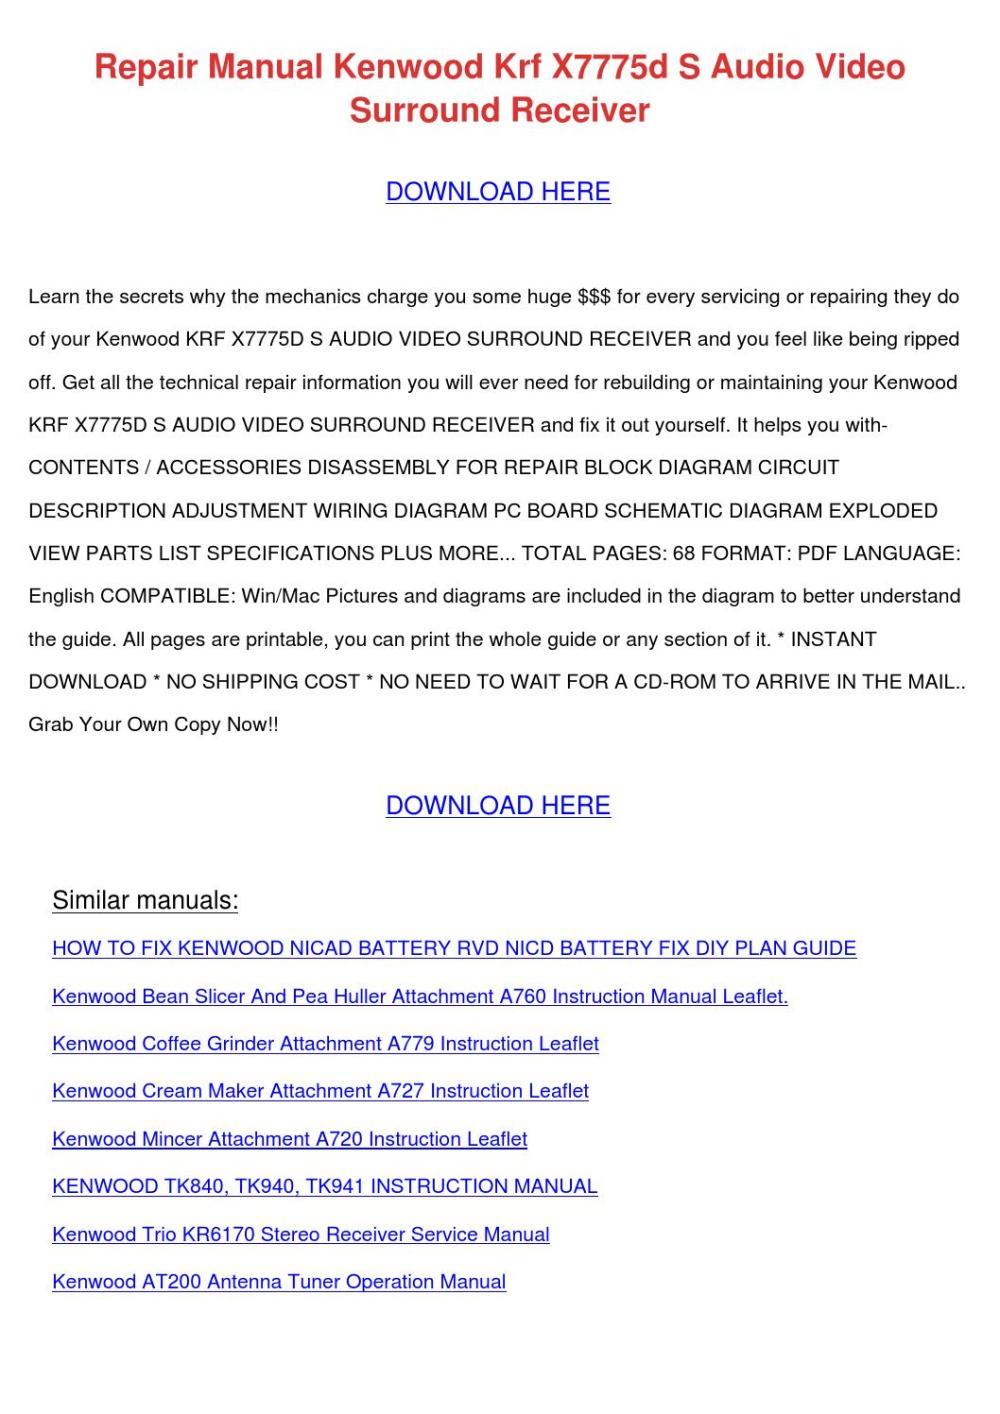 medium resolution of repair manual kenwood krf x7775d s audio vide by rafaelmontgomery issuu